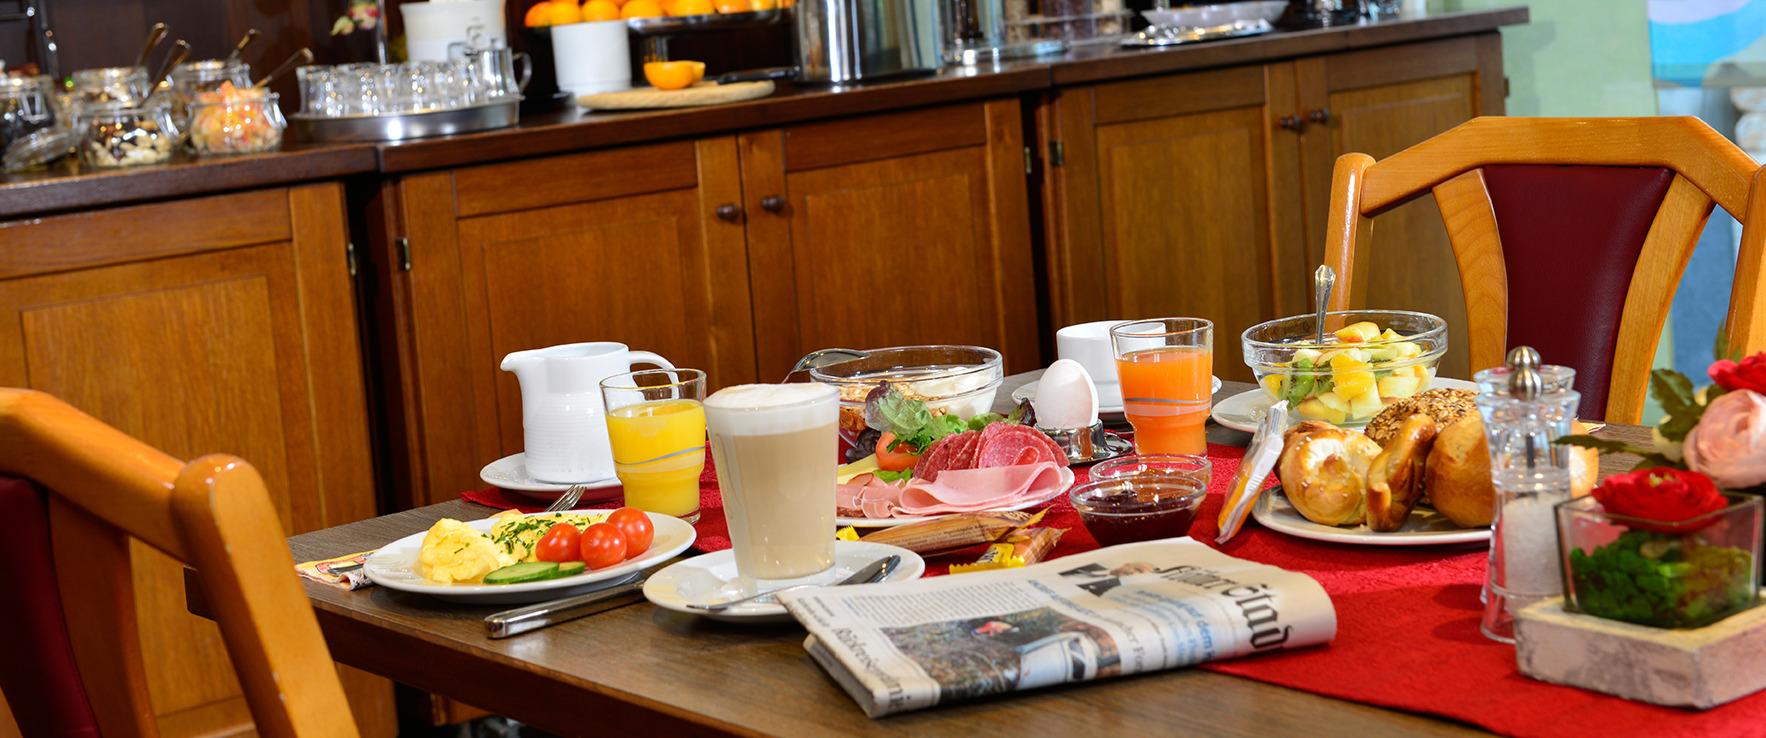 Hotel%20Hansen%201216_030_edited